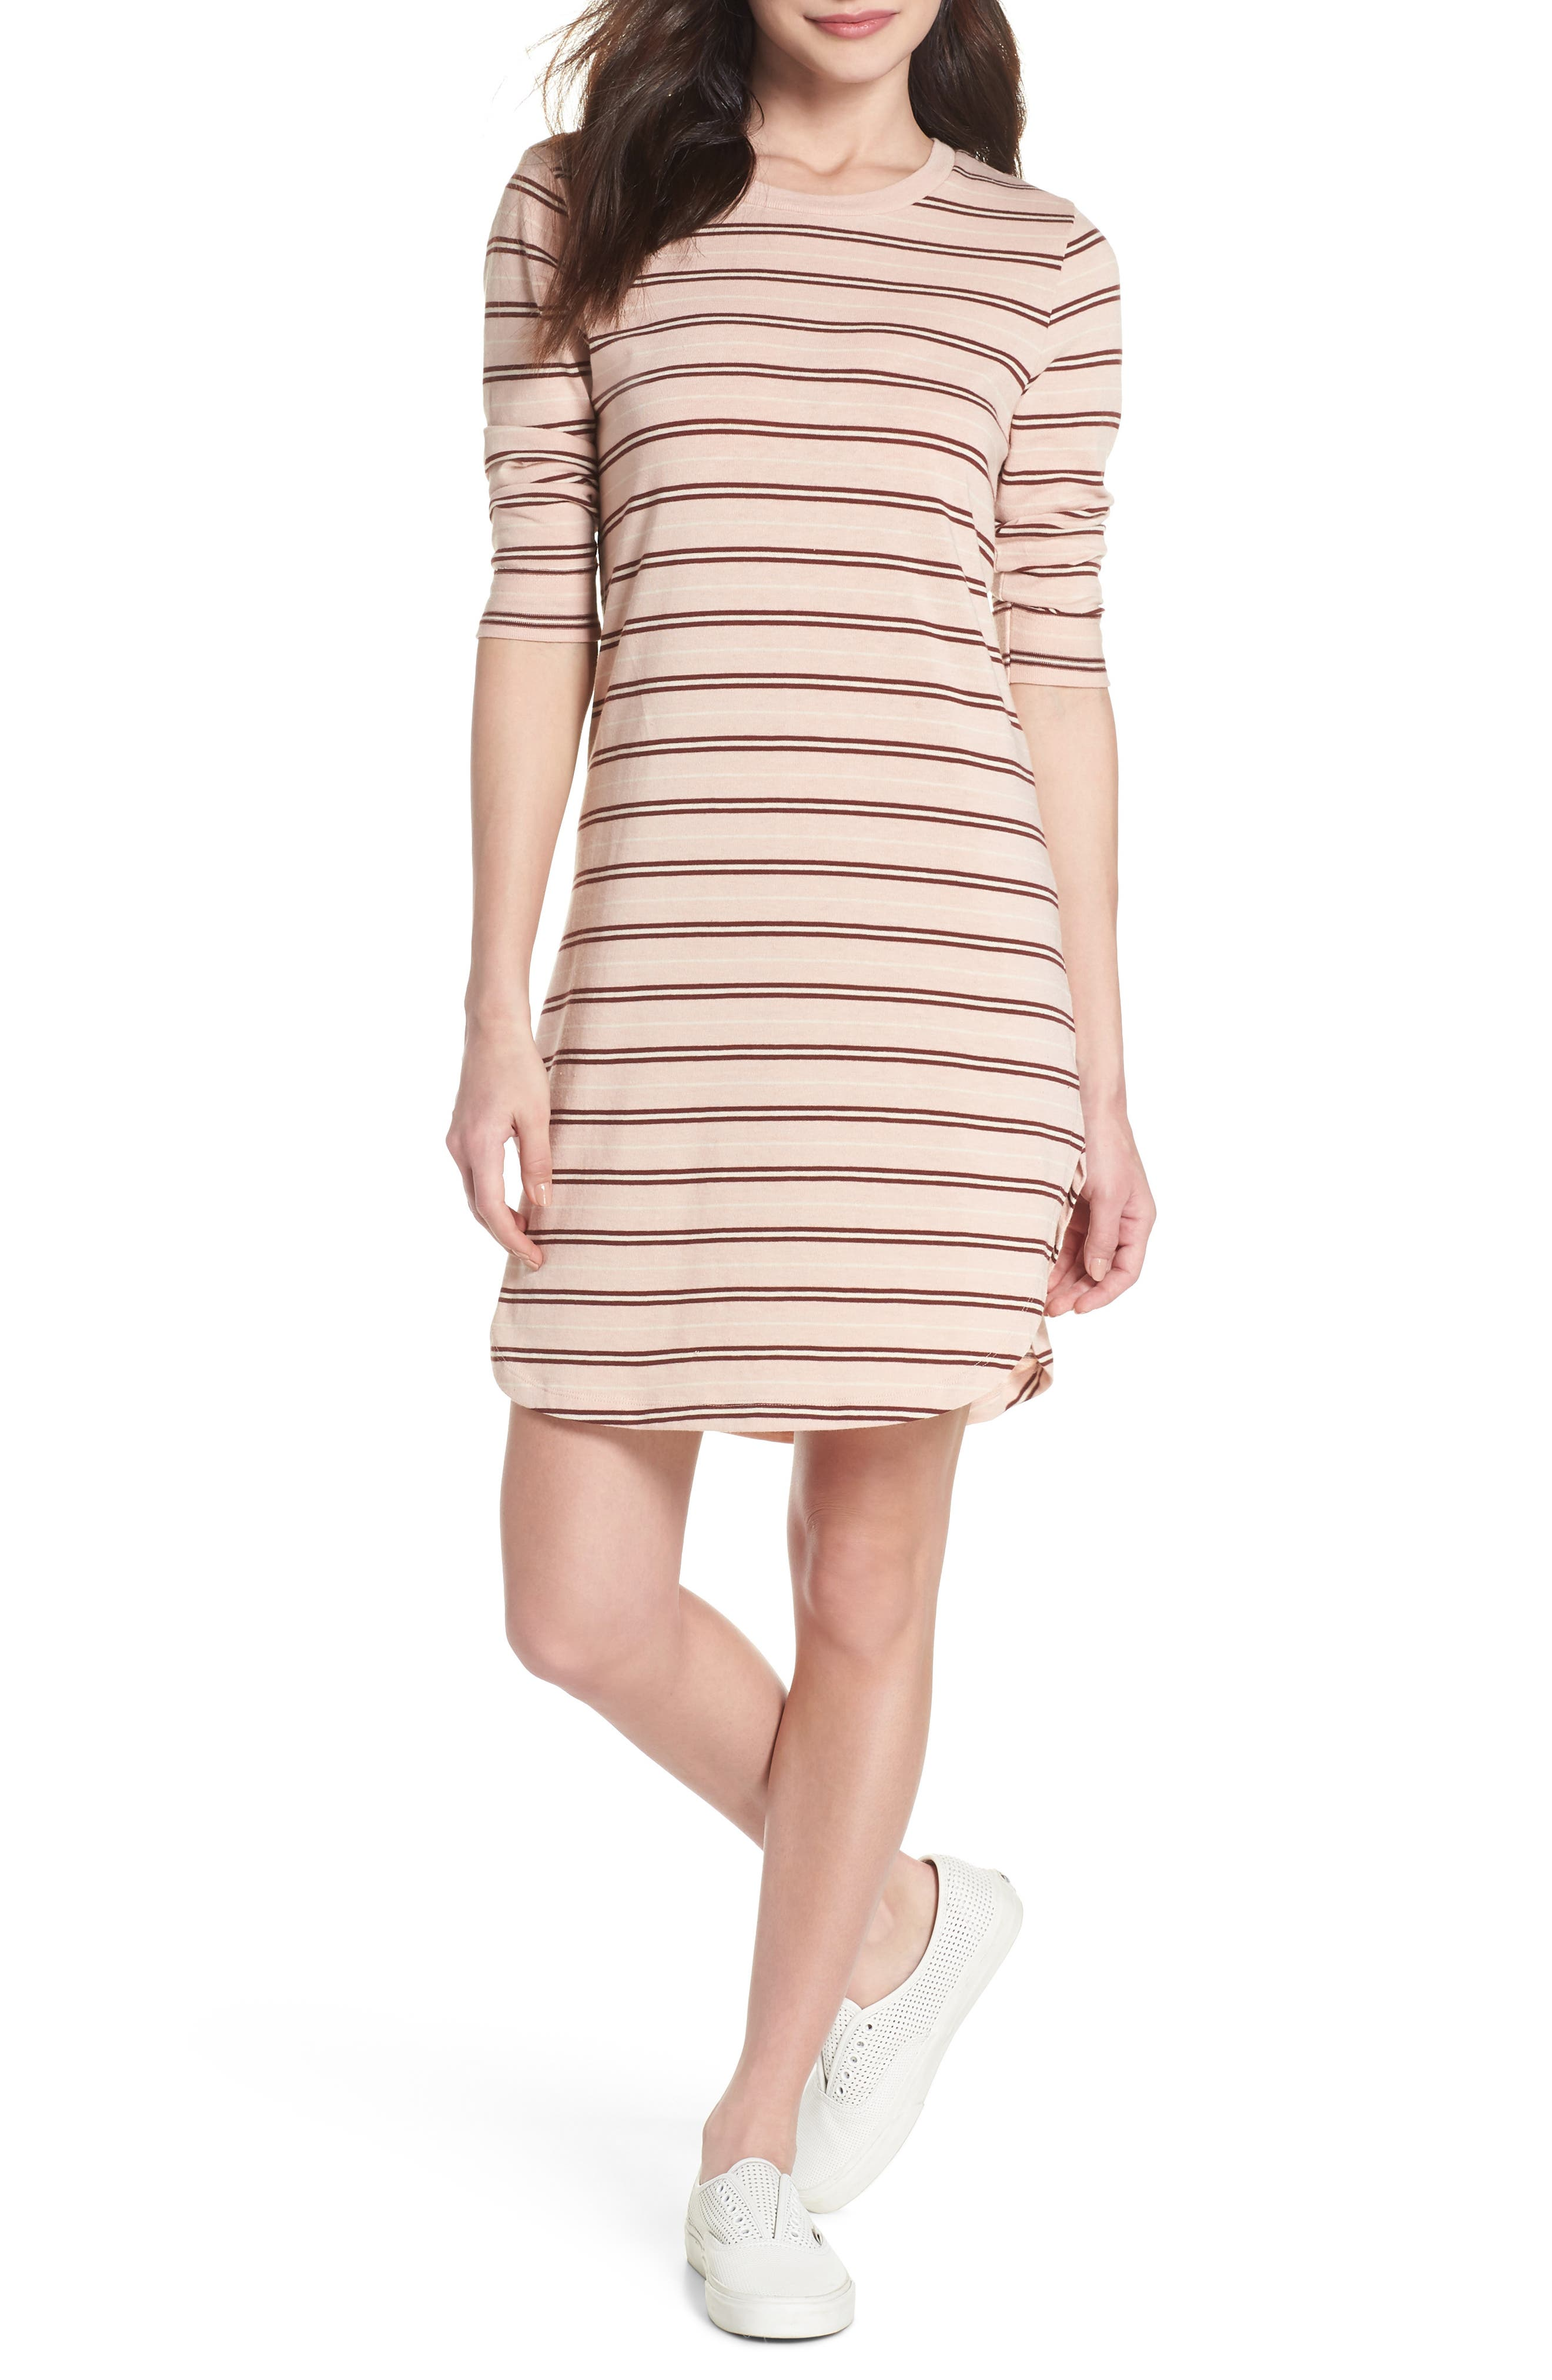 Saul Tunic Dress,                             Main thumbnail 1, color,                             650